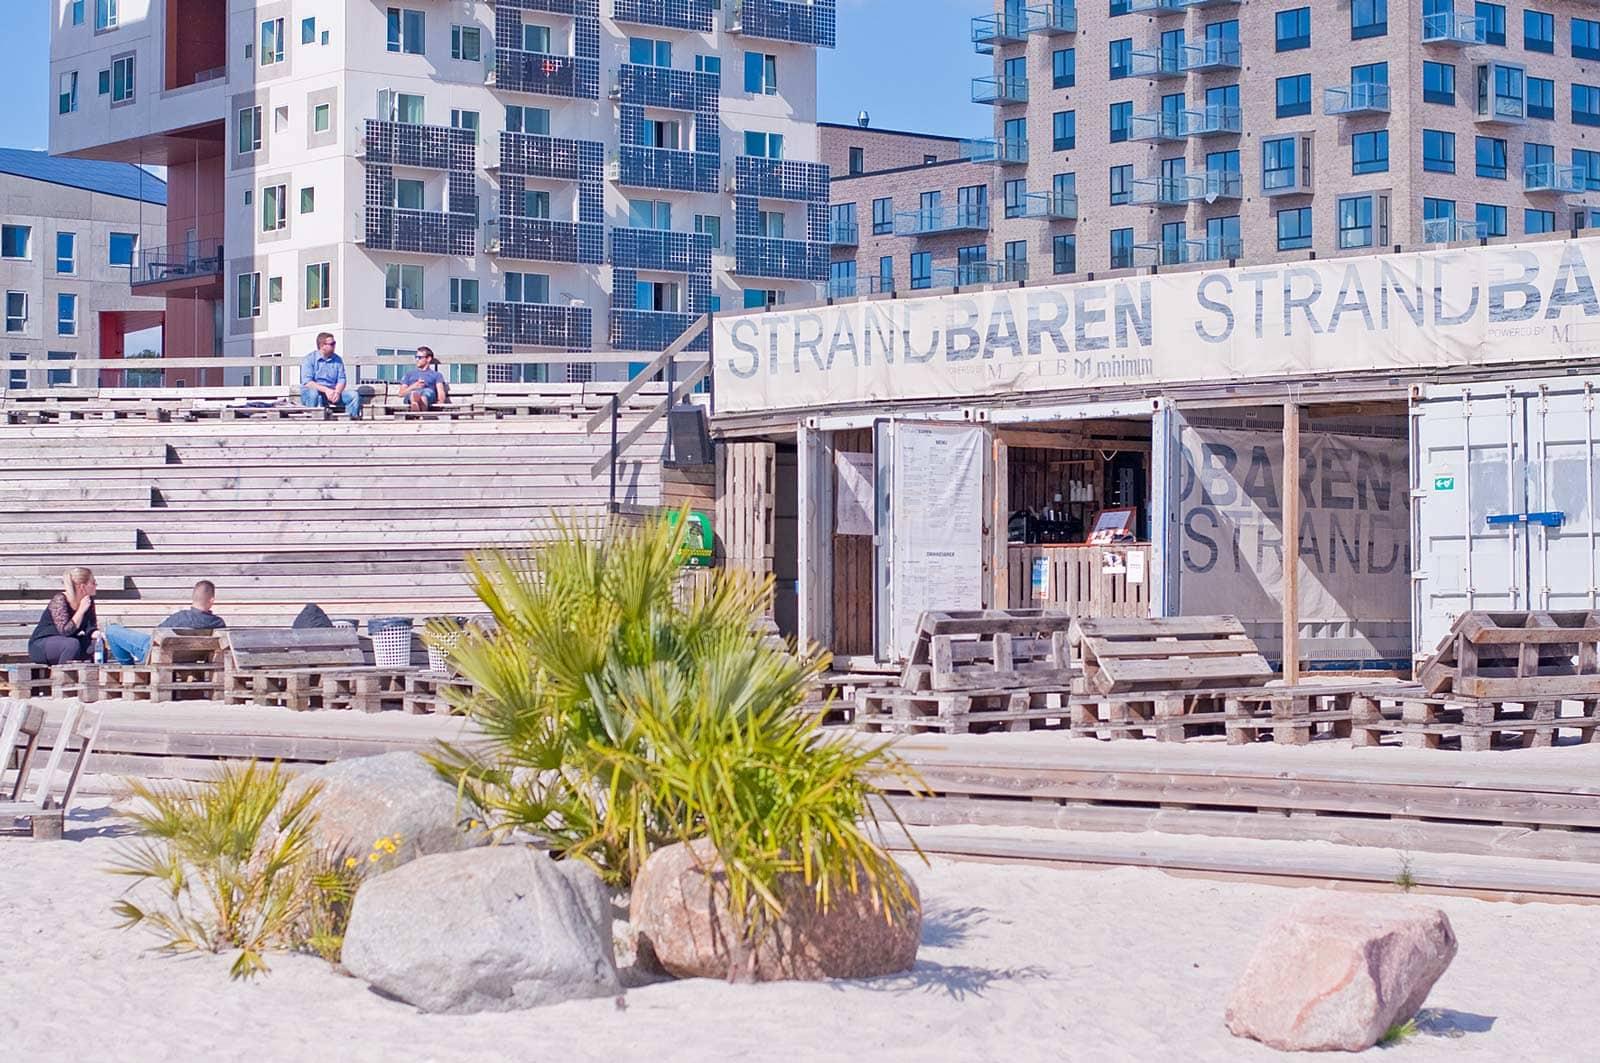 Strandbaren in Aarhus Ø